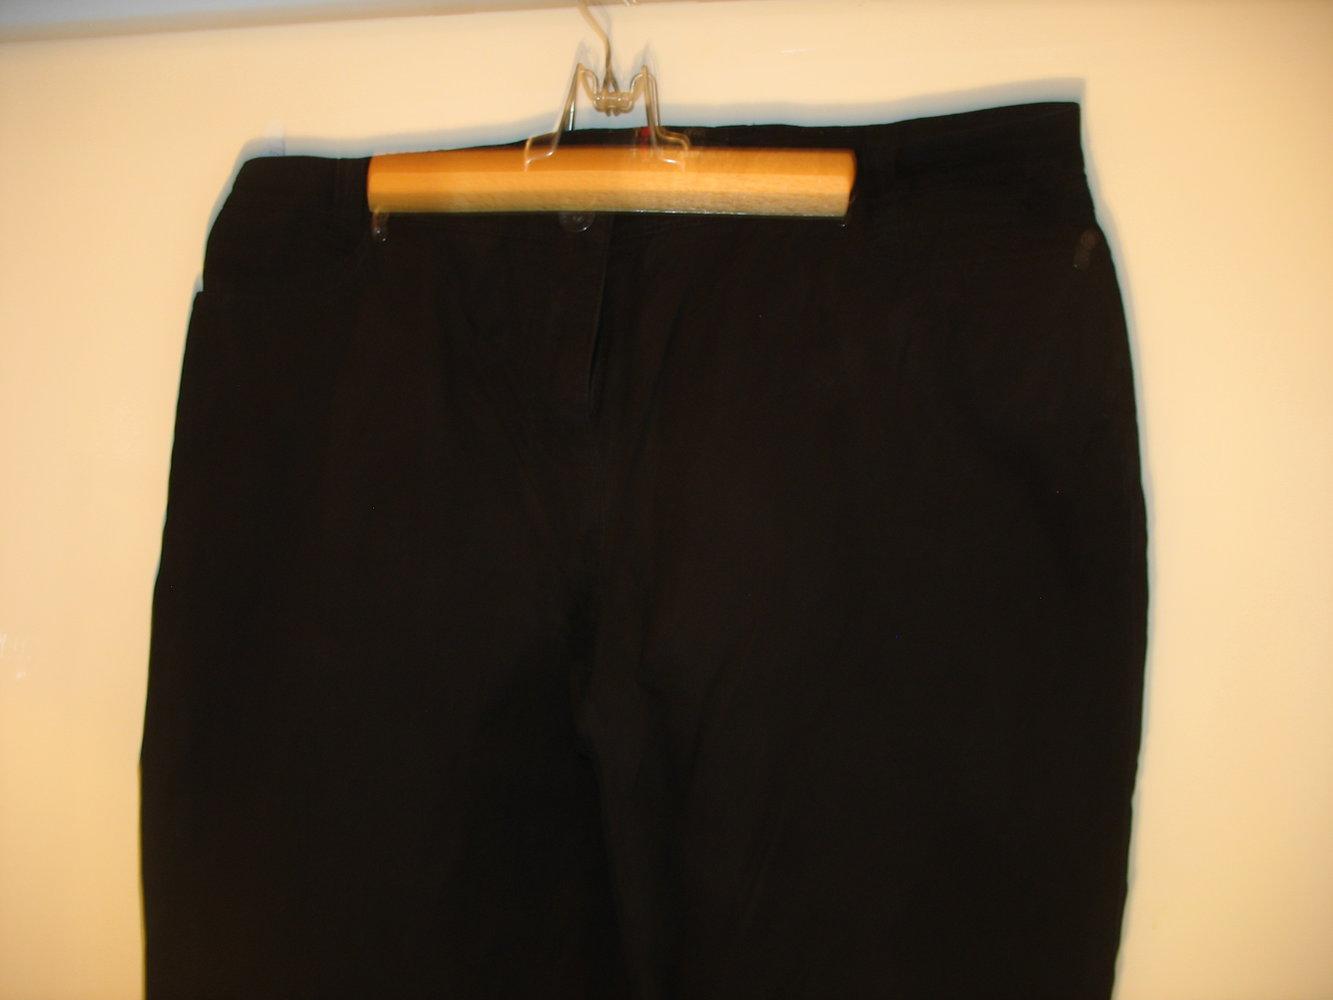 01d24c2063 Toni - Damen Jeans Gr. 44 Kurz :: Kleiderkorb.de